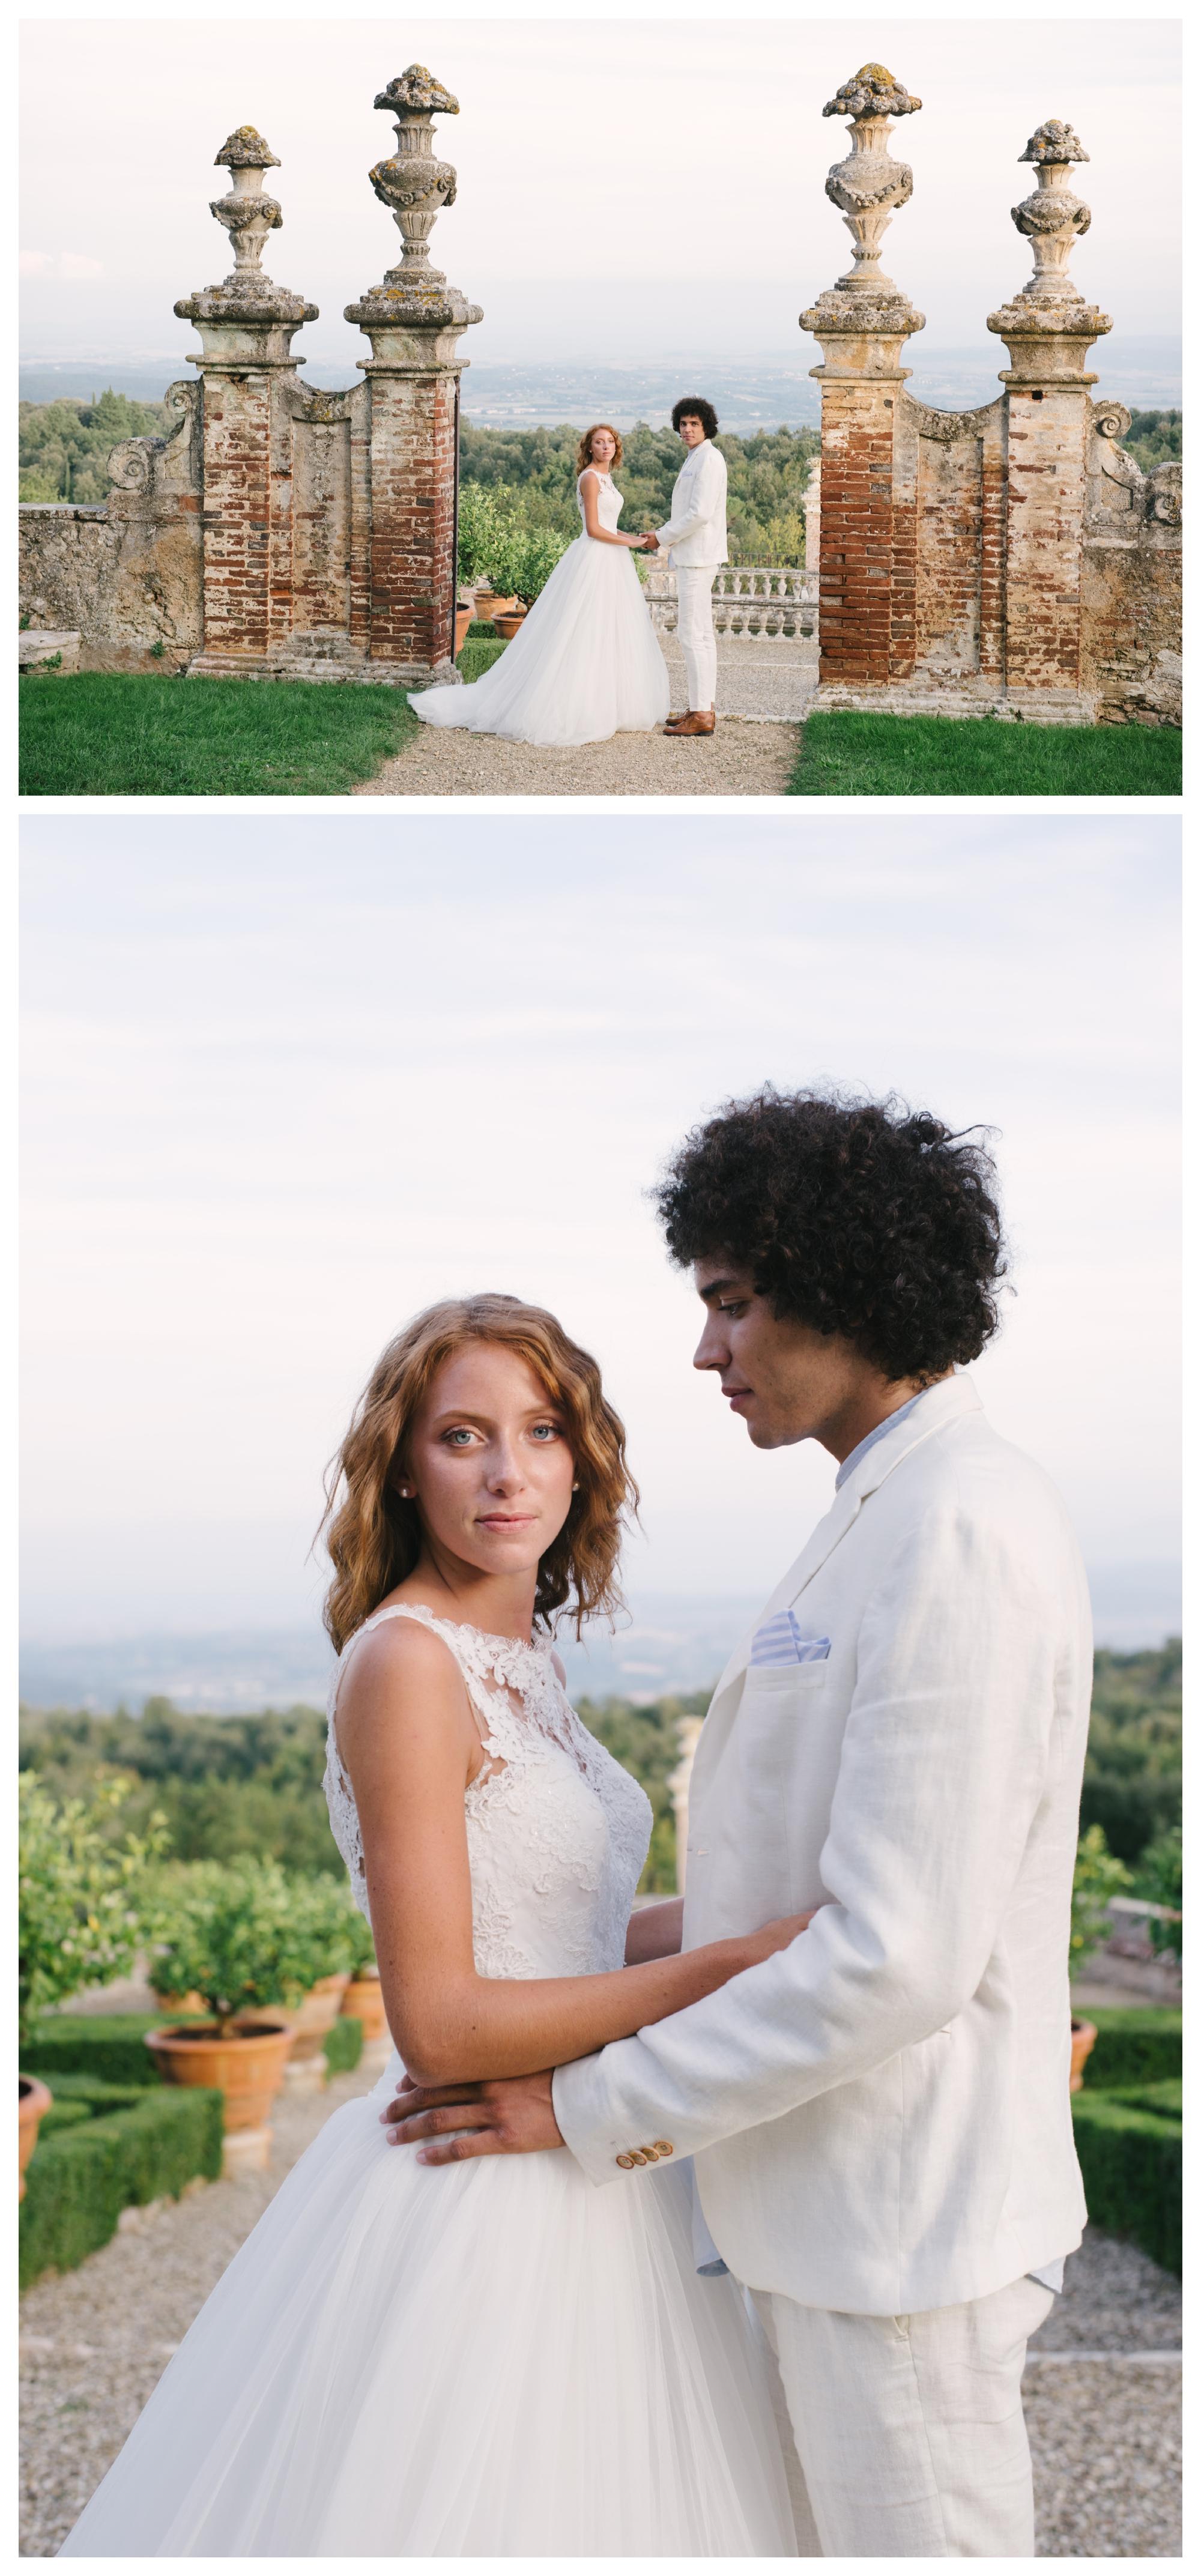 tuscany-castle-wedding-photographer-italy-williamsburgphotostudios-_0019.jpg